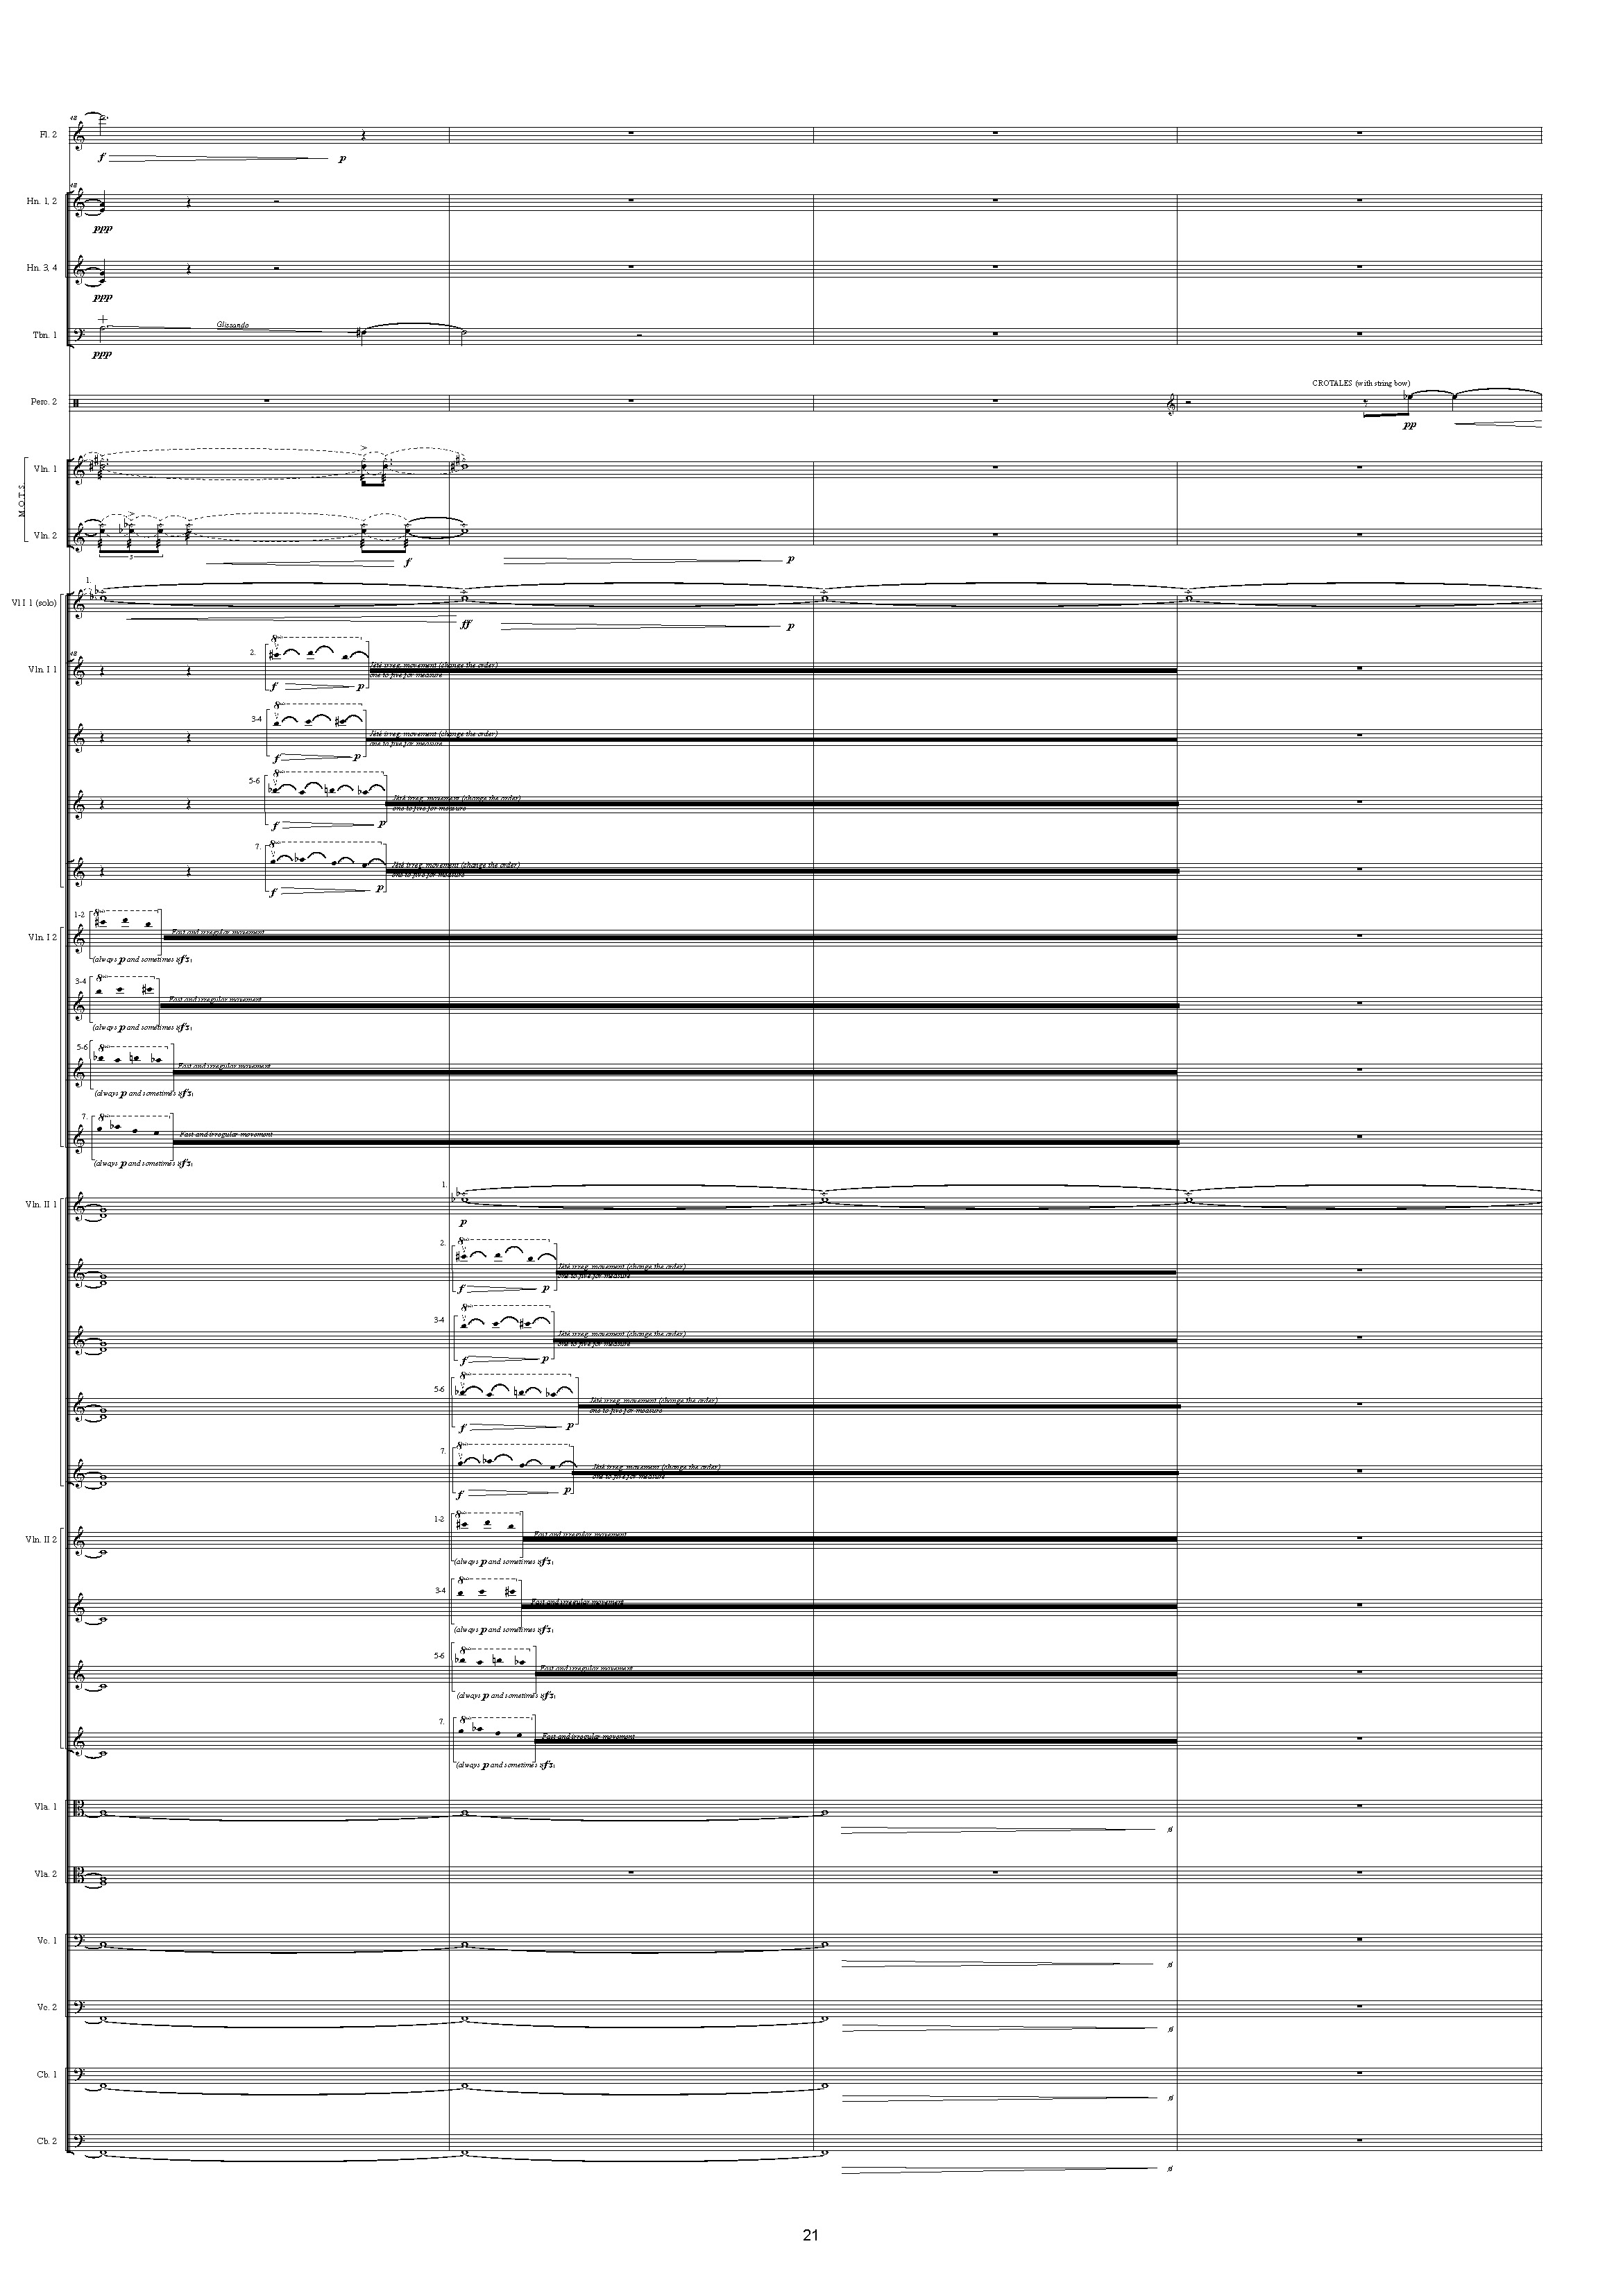 METANOIA_2009-RAPPOPORT_Seite_21.jpg